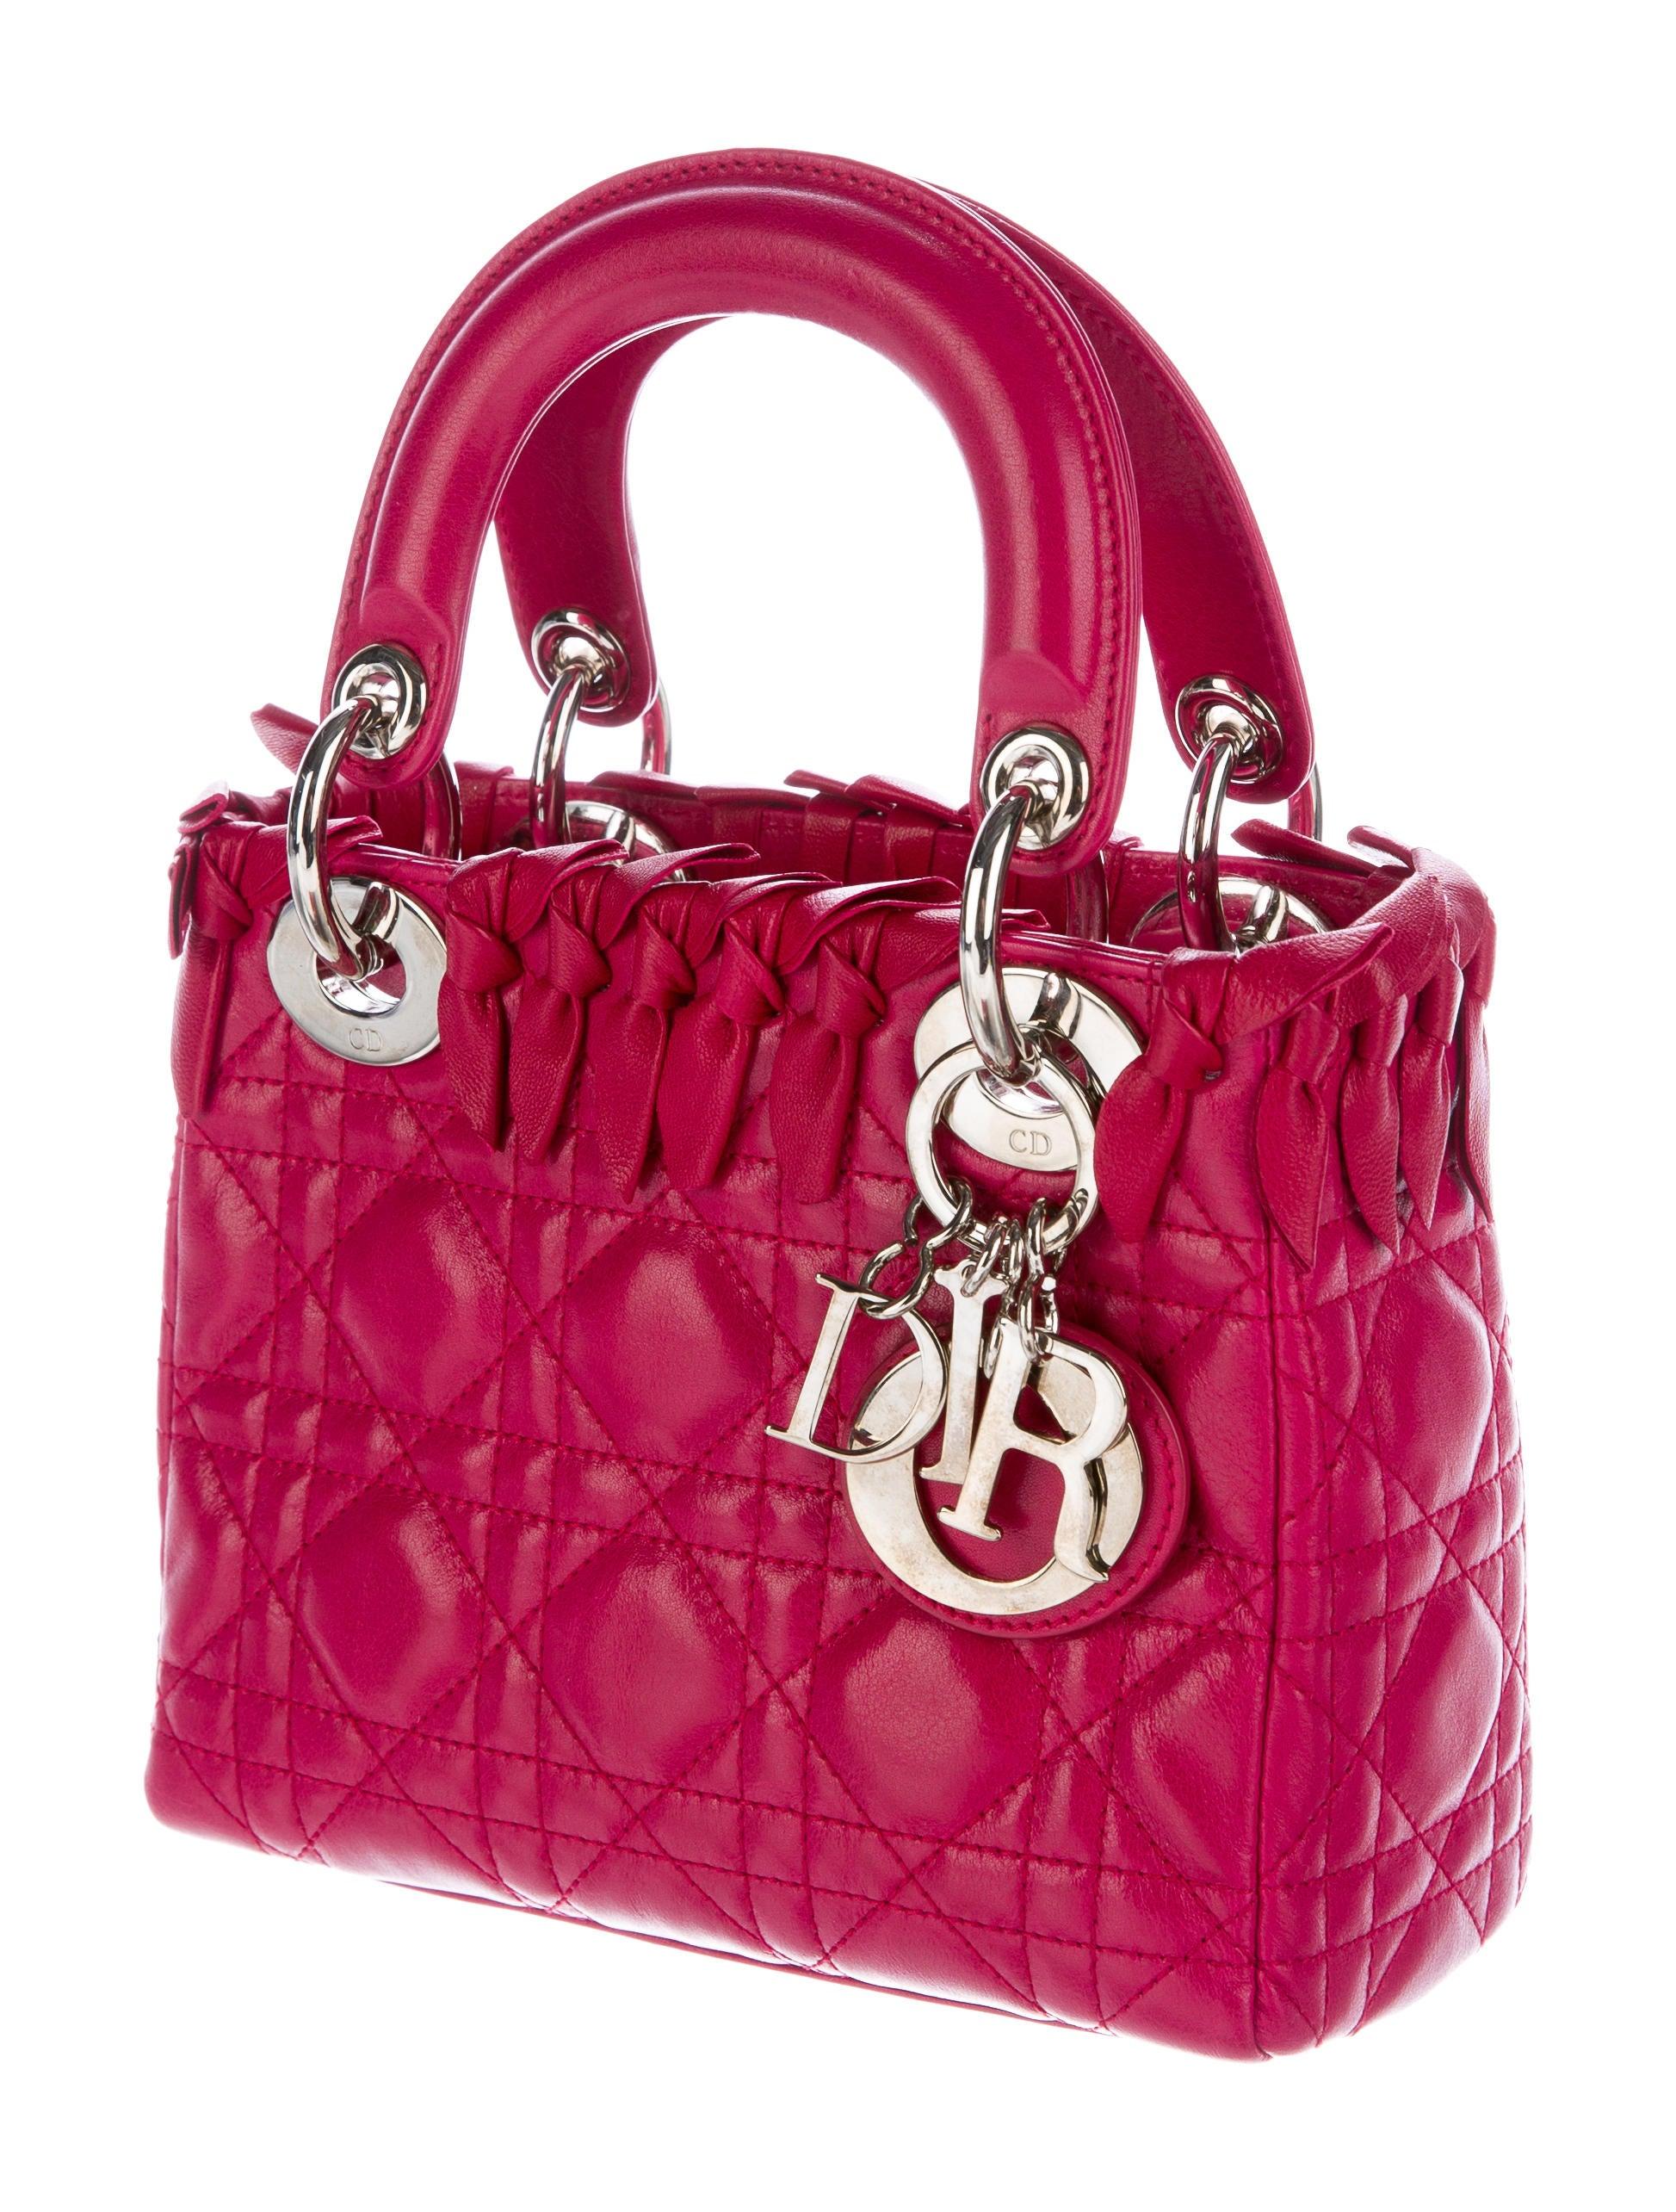 christian dior mini lady dior bag handbags chr56777 the realreal. Black Bedroom Furniture Sets. Home Design Ideas